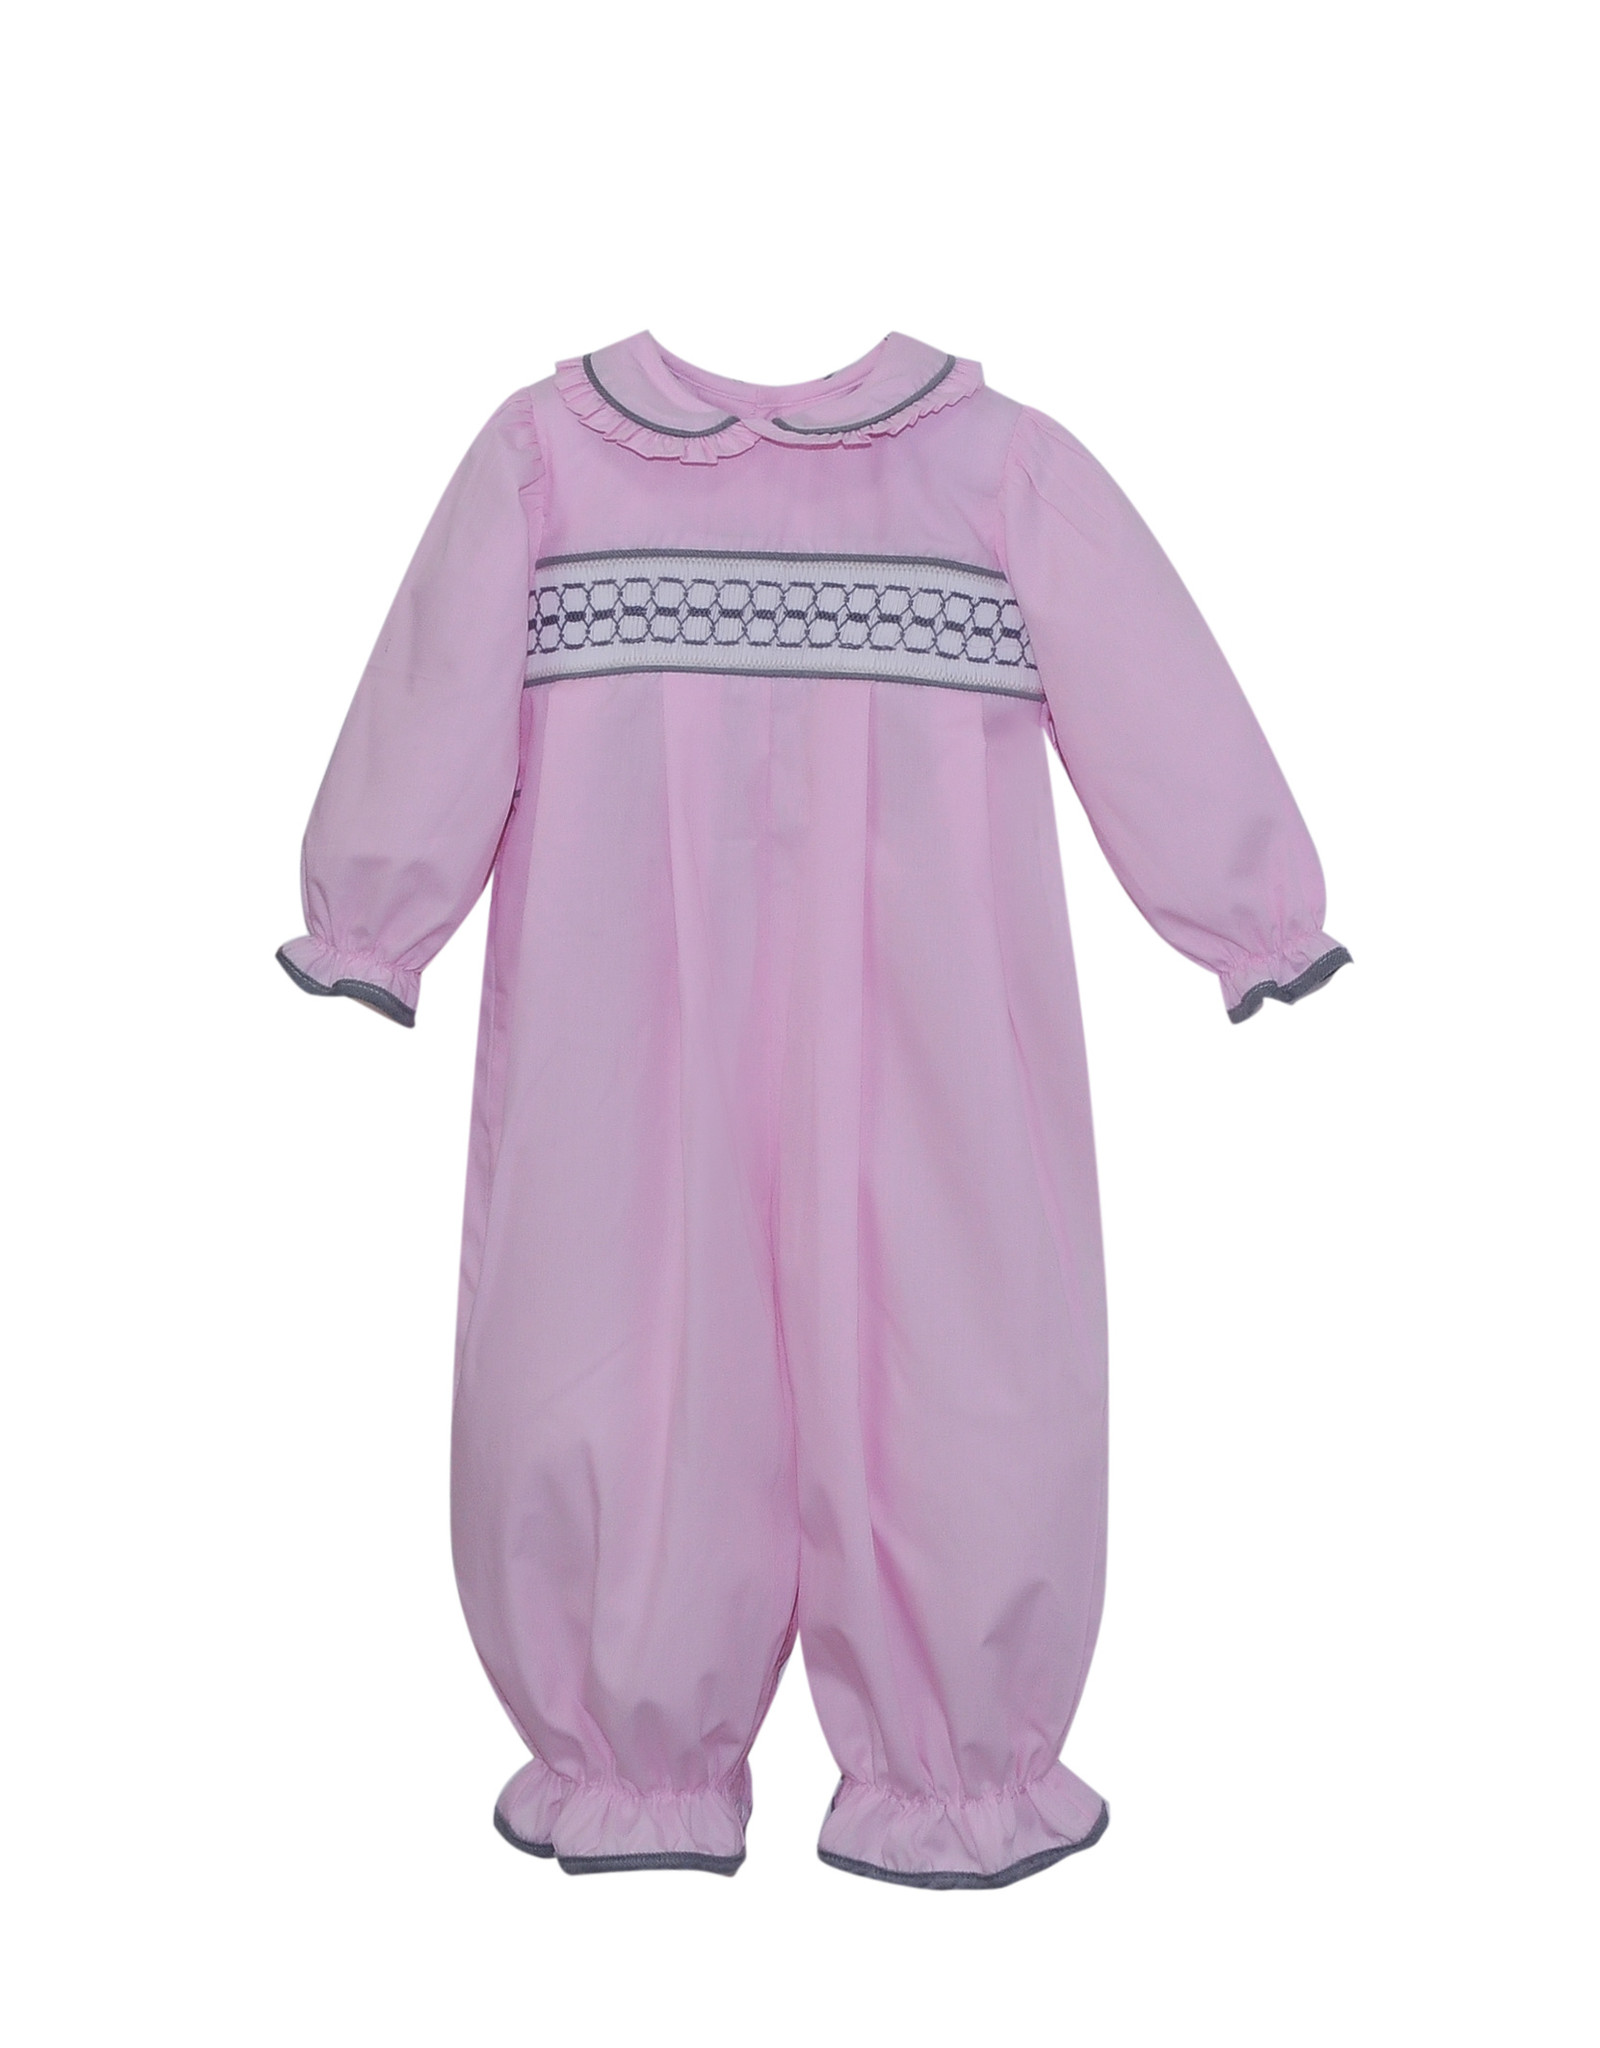 LullabySet Pink And Grey Rosie Romper